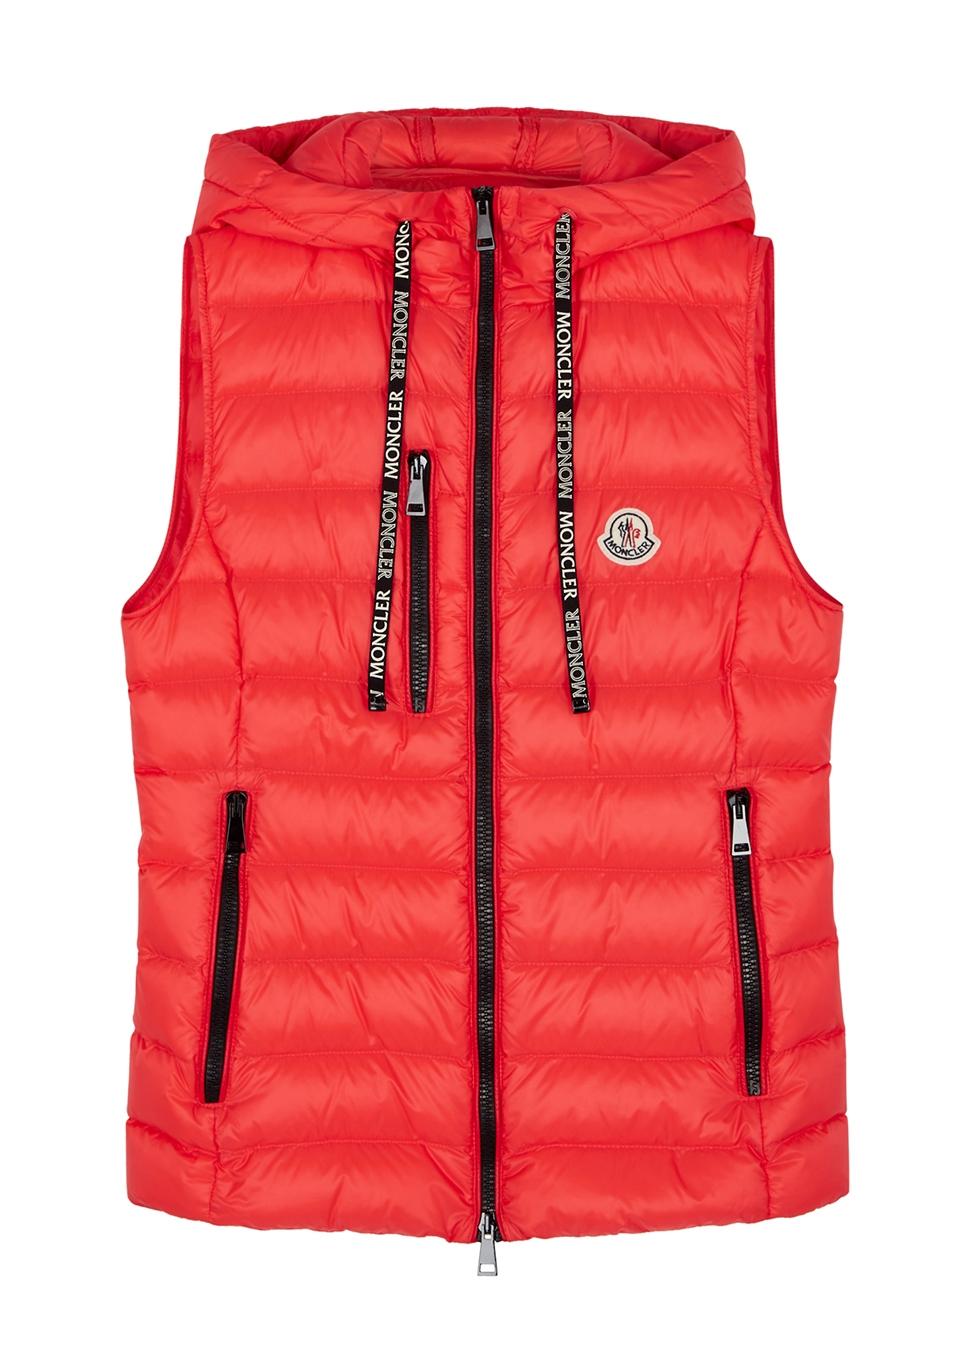 4a169b9924 Women s Designer Casual Jackets - Harvey Nichols